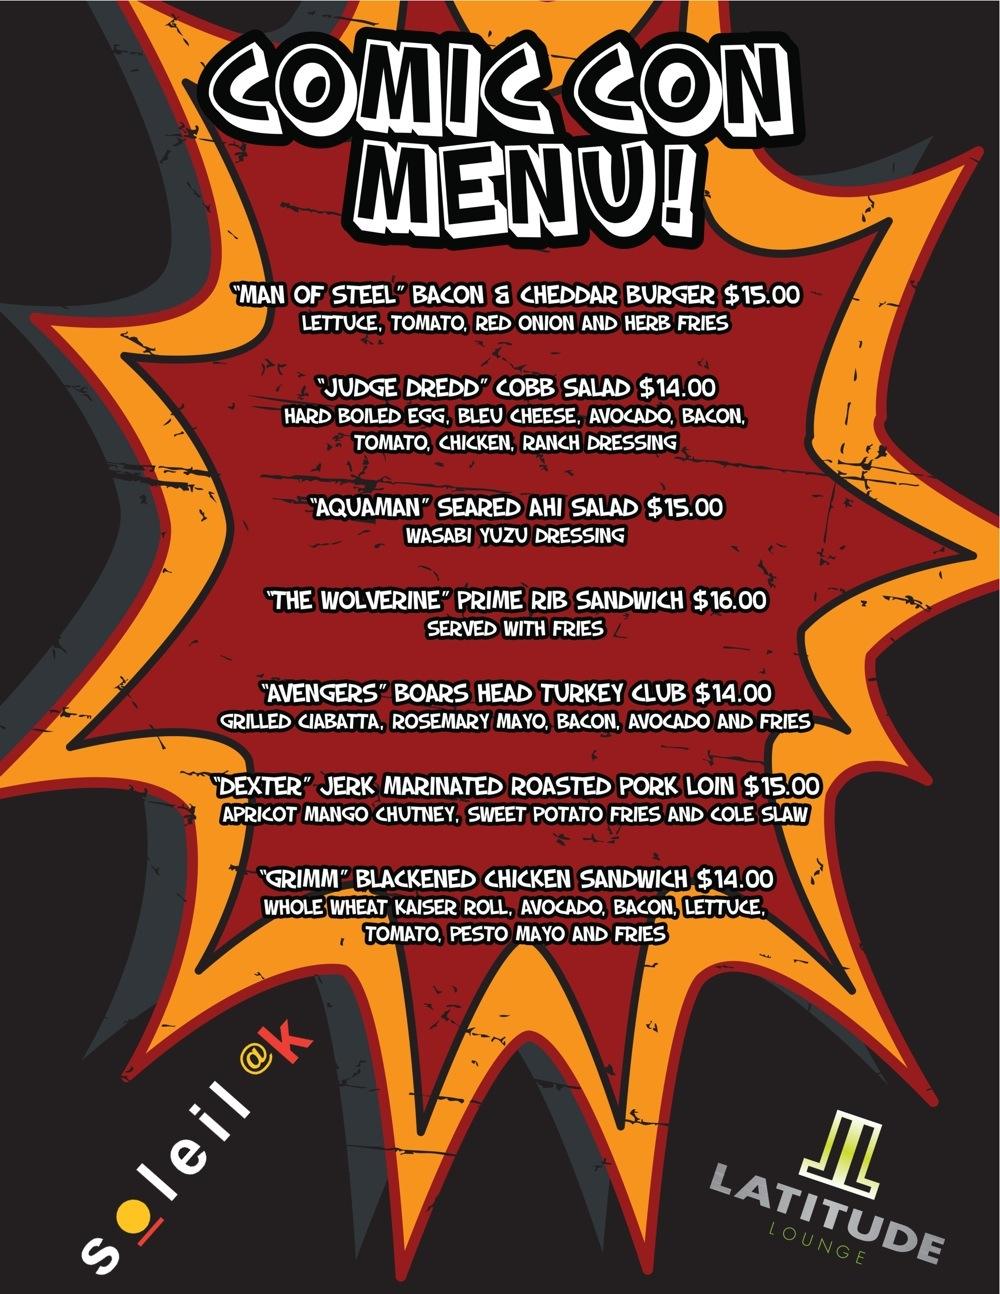 comic con menu.jpg